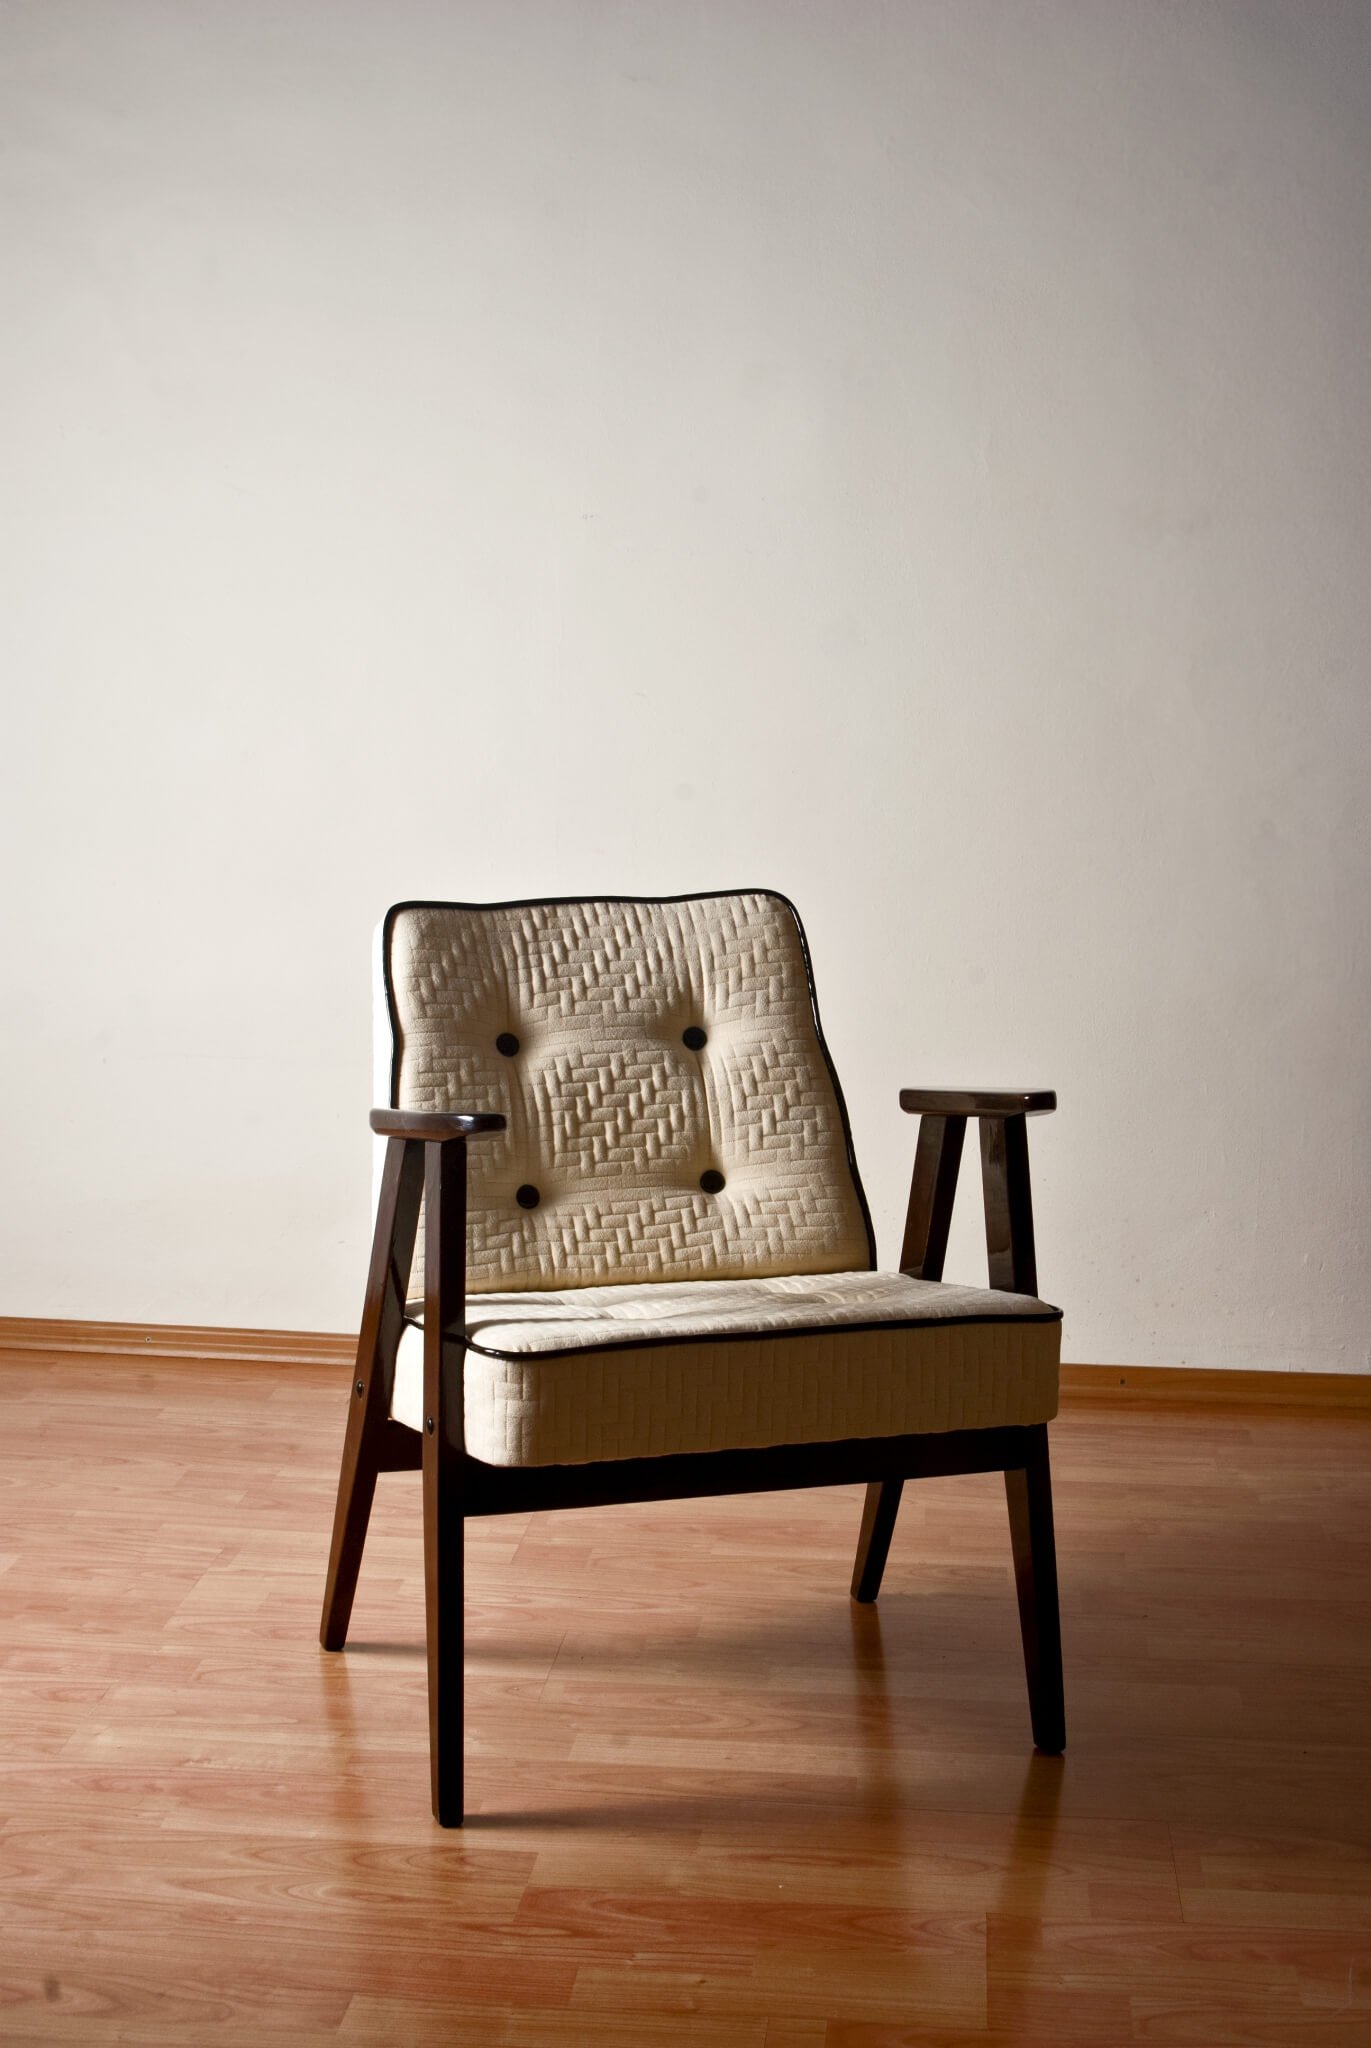 Homemid century modernkaros 60s restored mid century modern chair